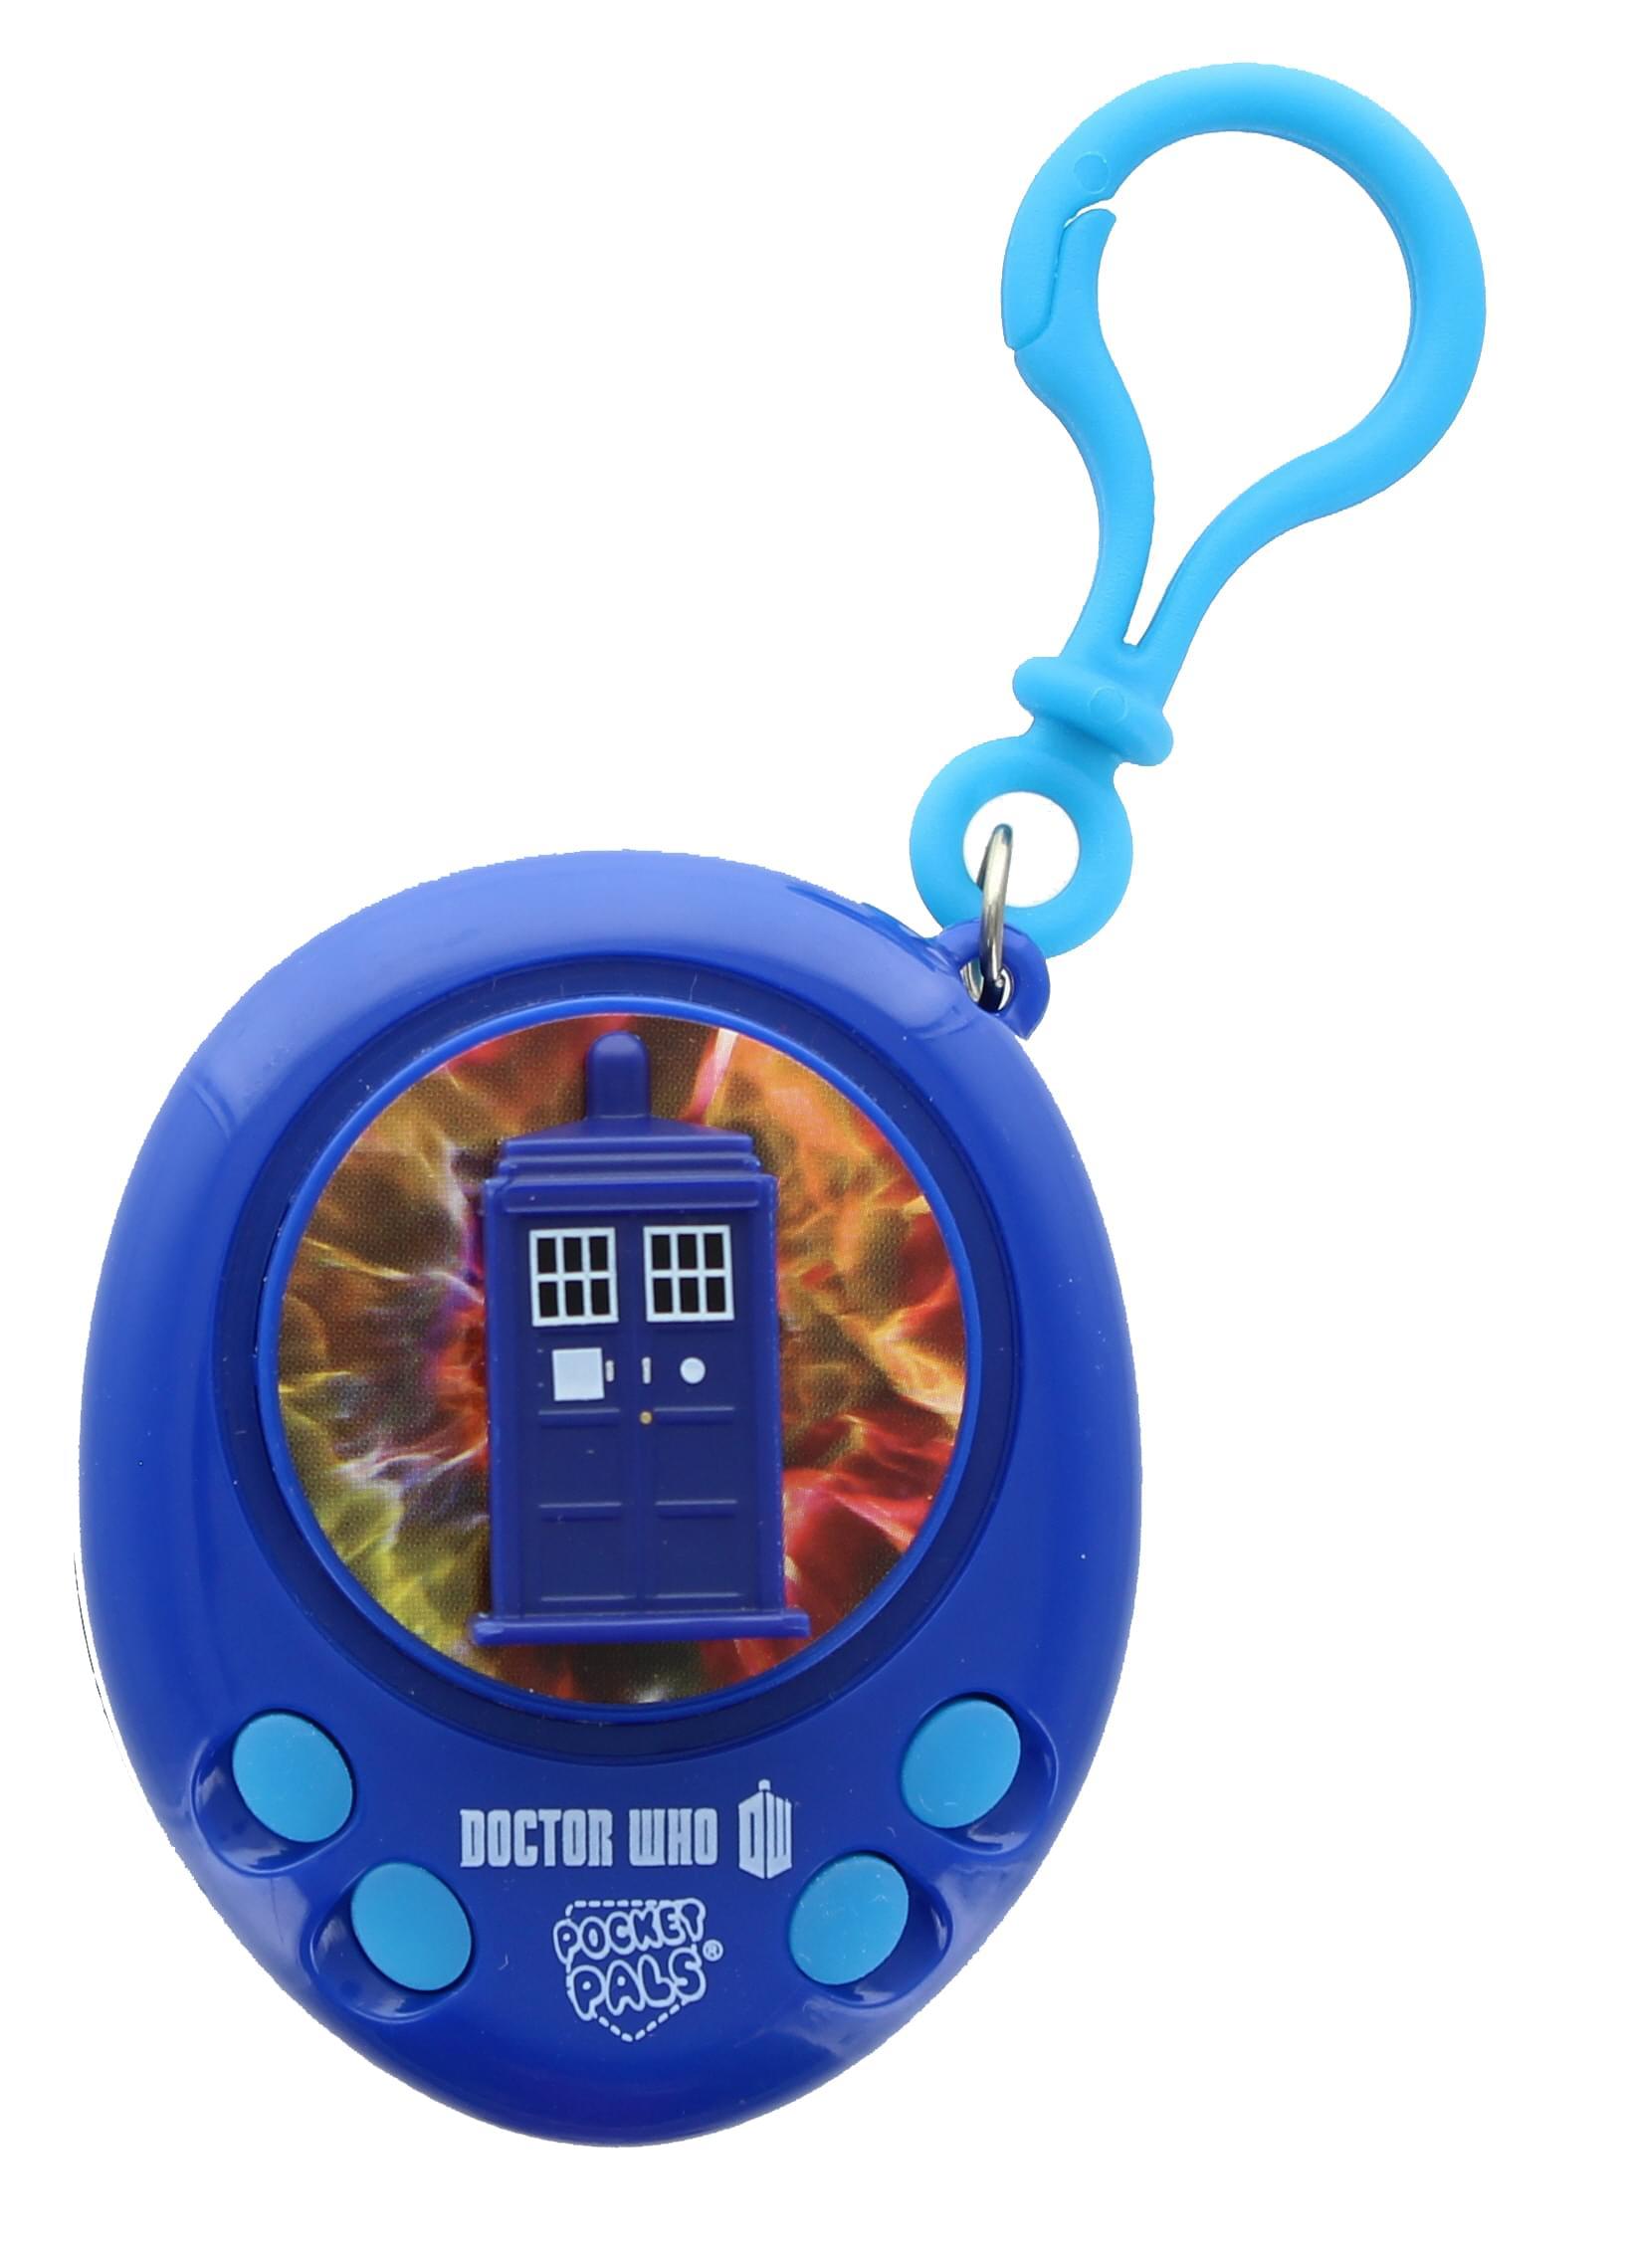 Doctor Who TARDIS Pocket Pal Talking Clip On Key Ring